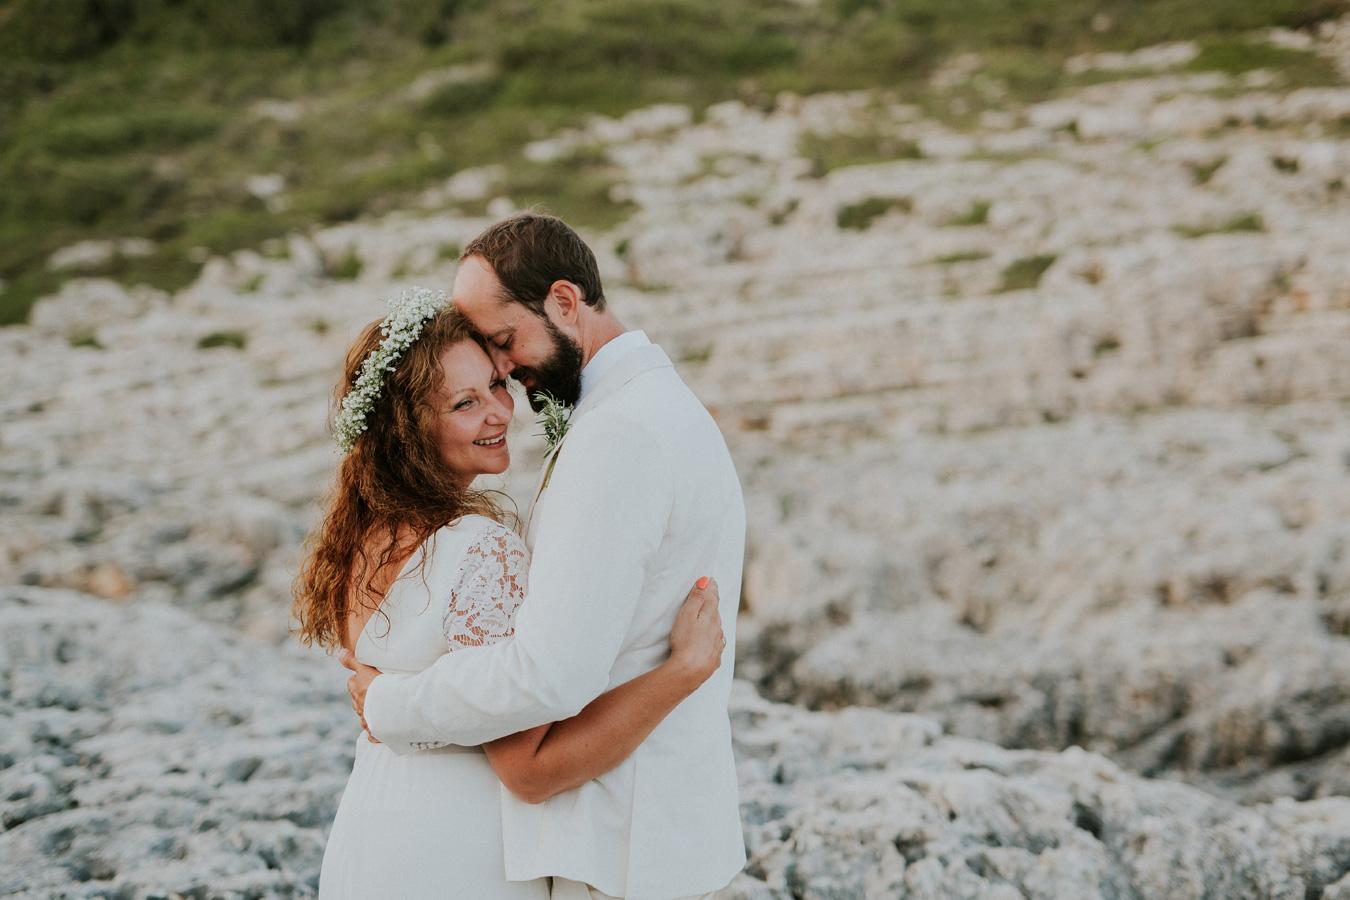 070-bryllupsfotograf-oslo-destinasjonsbryllup-fotograf-tone-tvedt.jpg